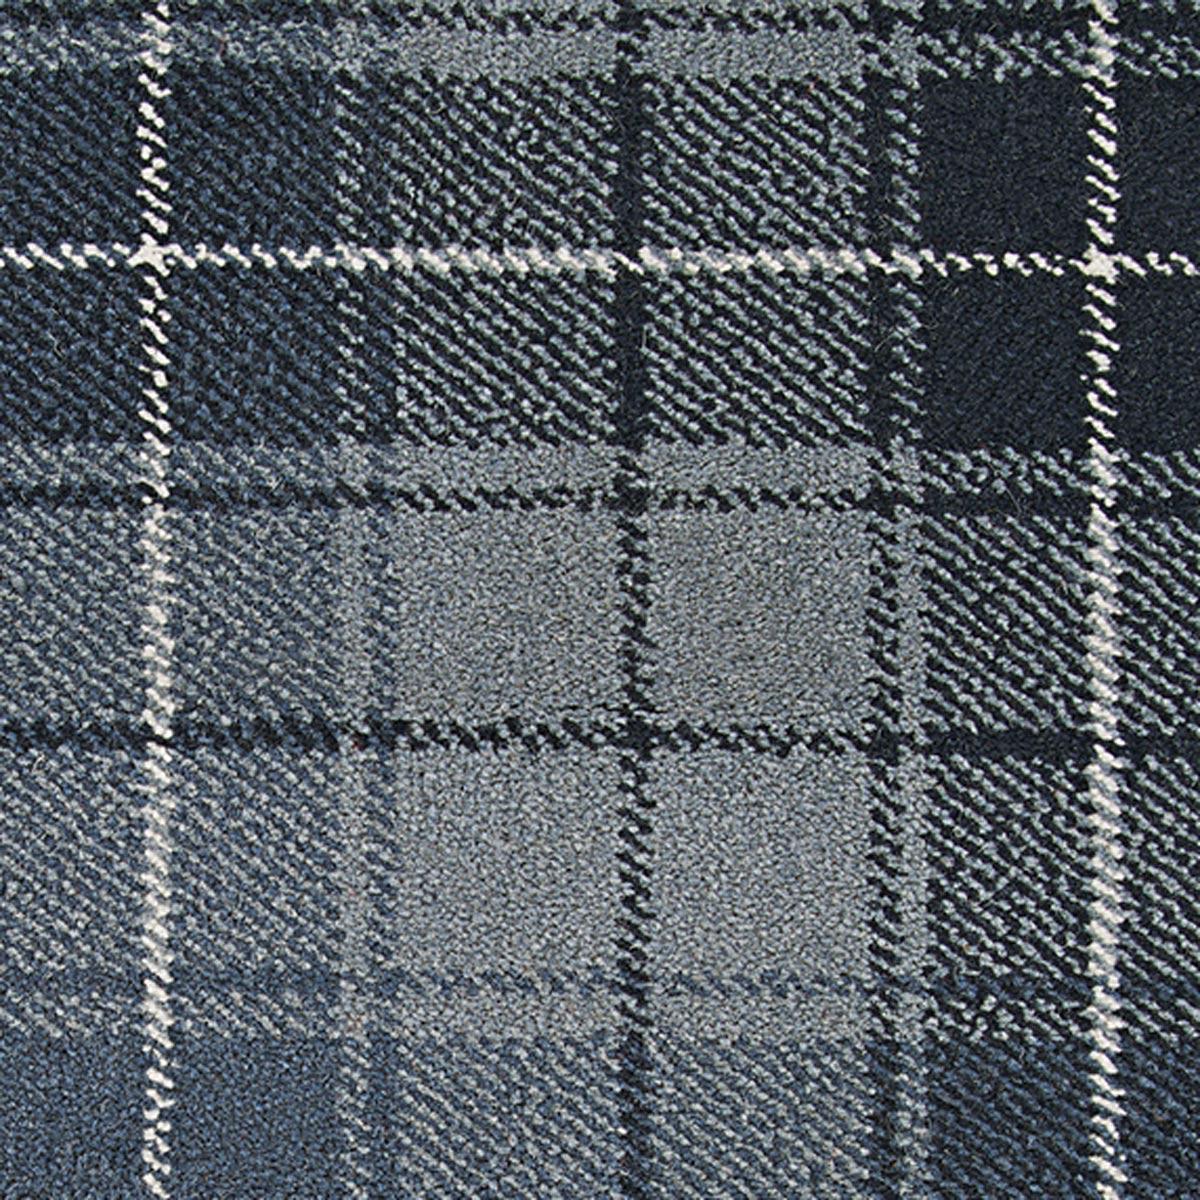 rocky-tartan_wool-nylon_broadloom_patterson-flynn-martin_pfm